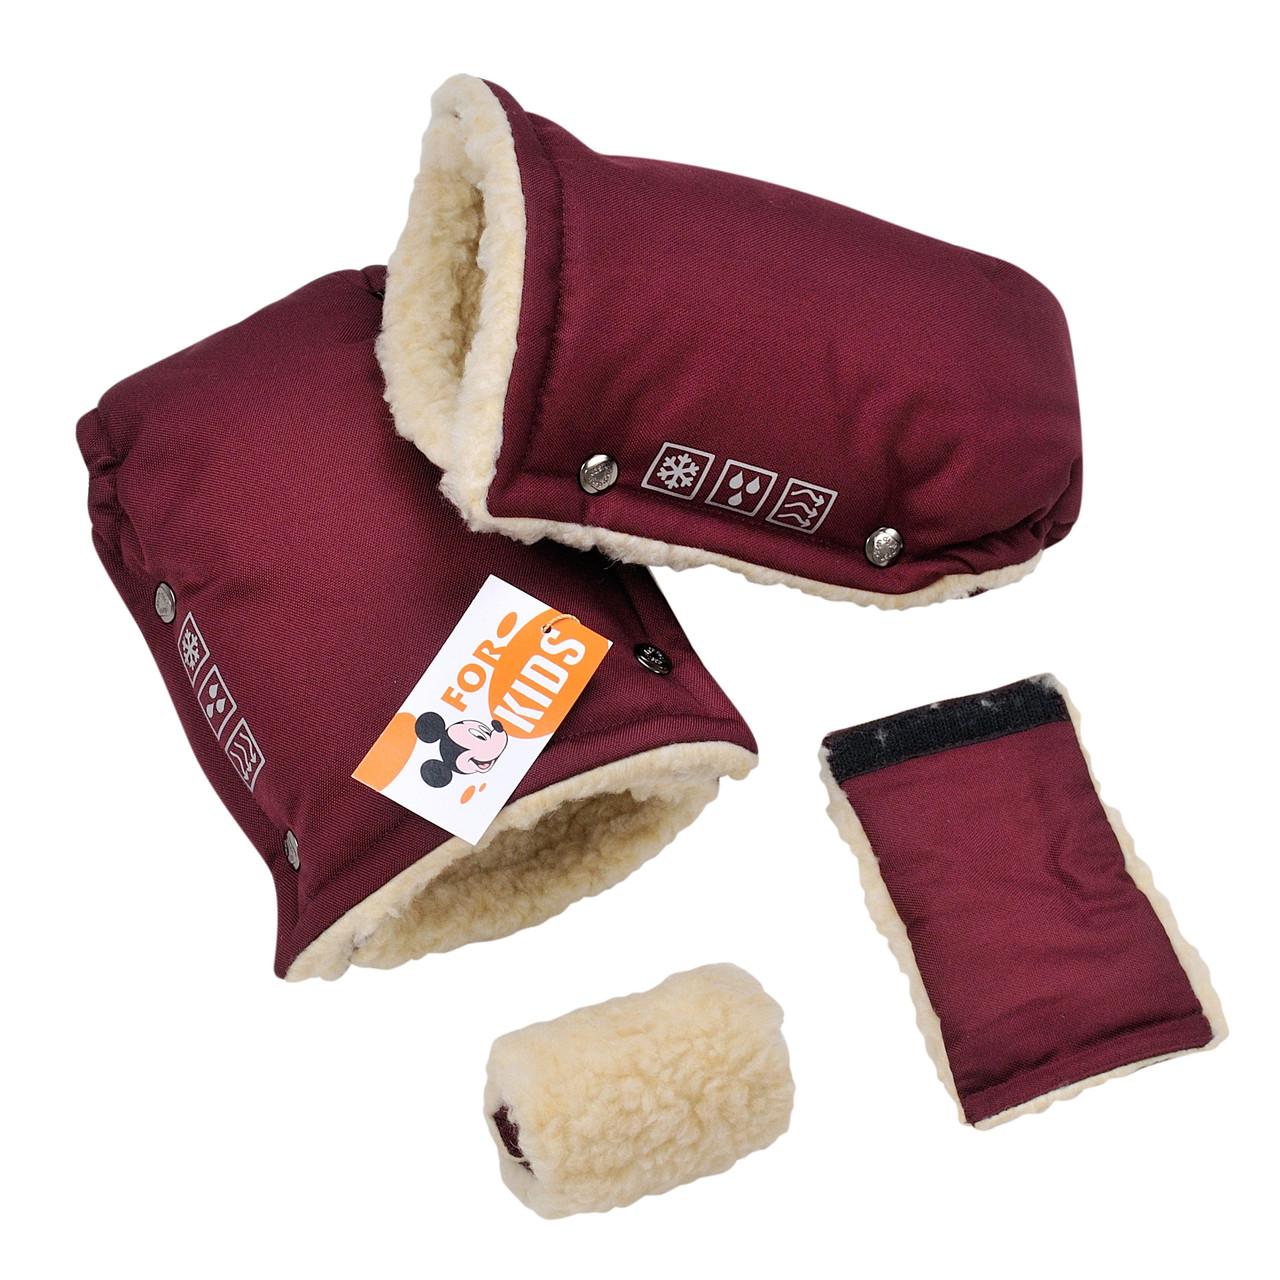 Рукавицы-муфта на коляску и санки на овчине For Kids бордовые